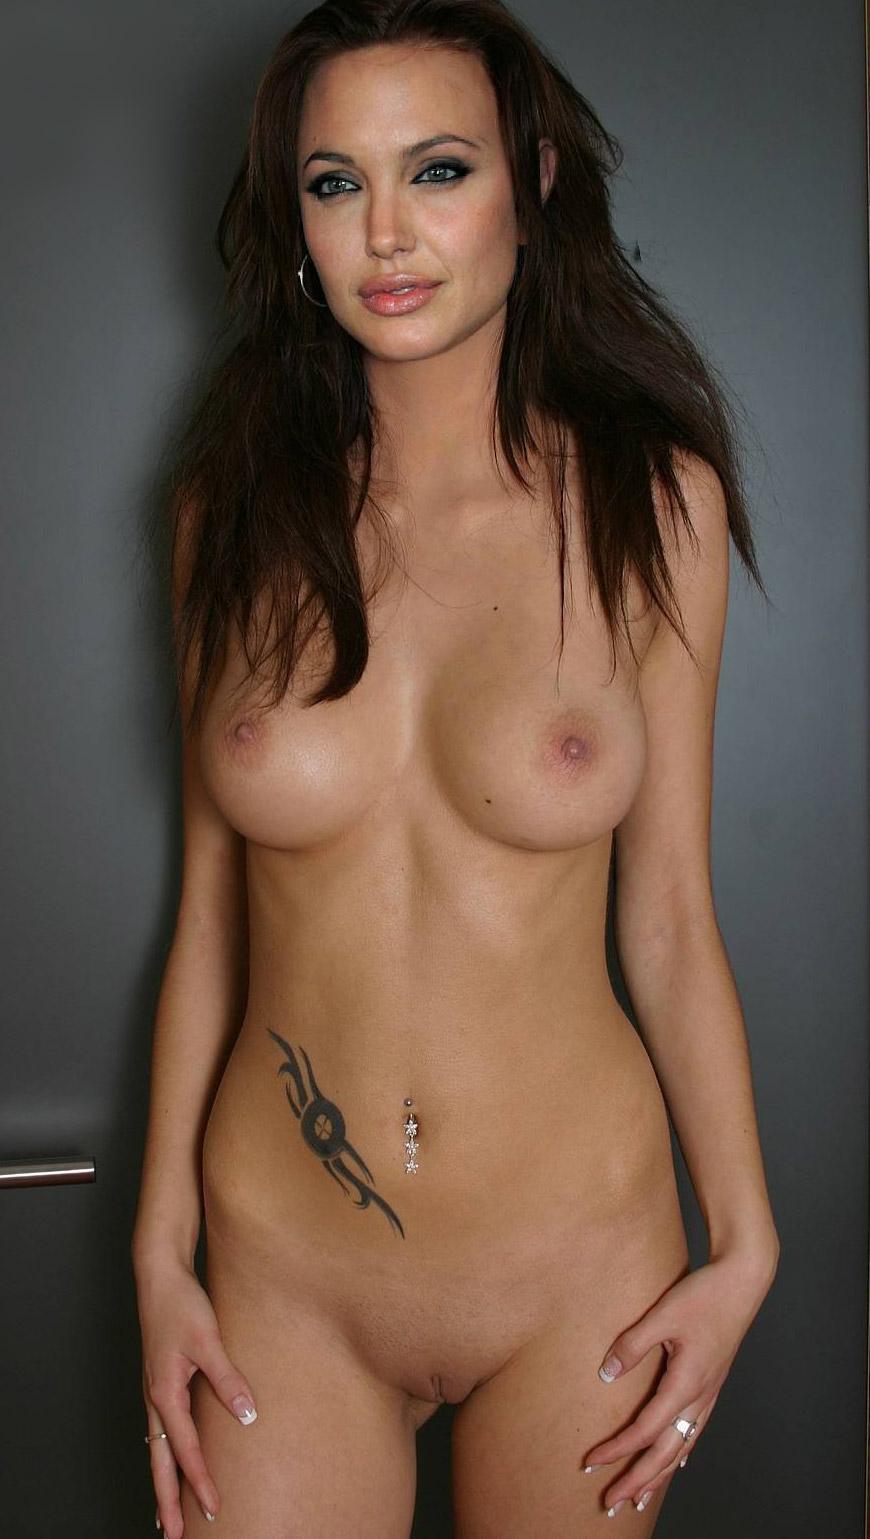 Angelina jolie sexphoto nude vids